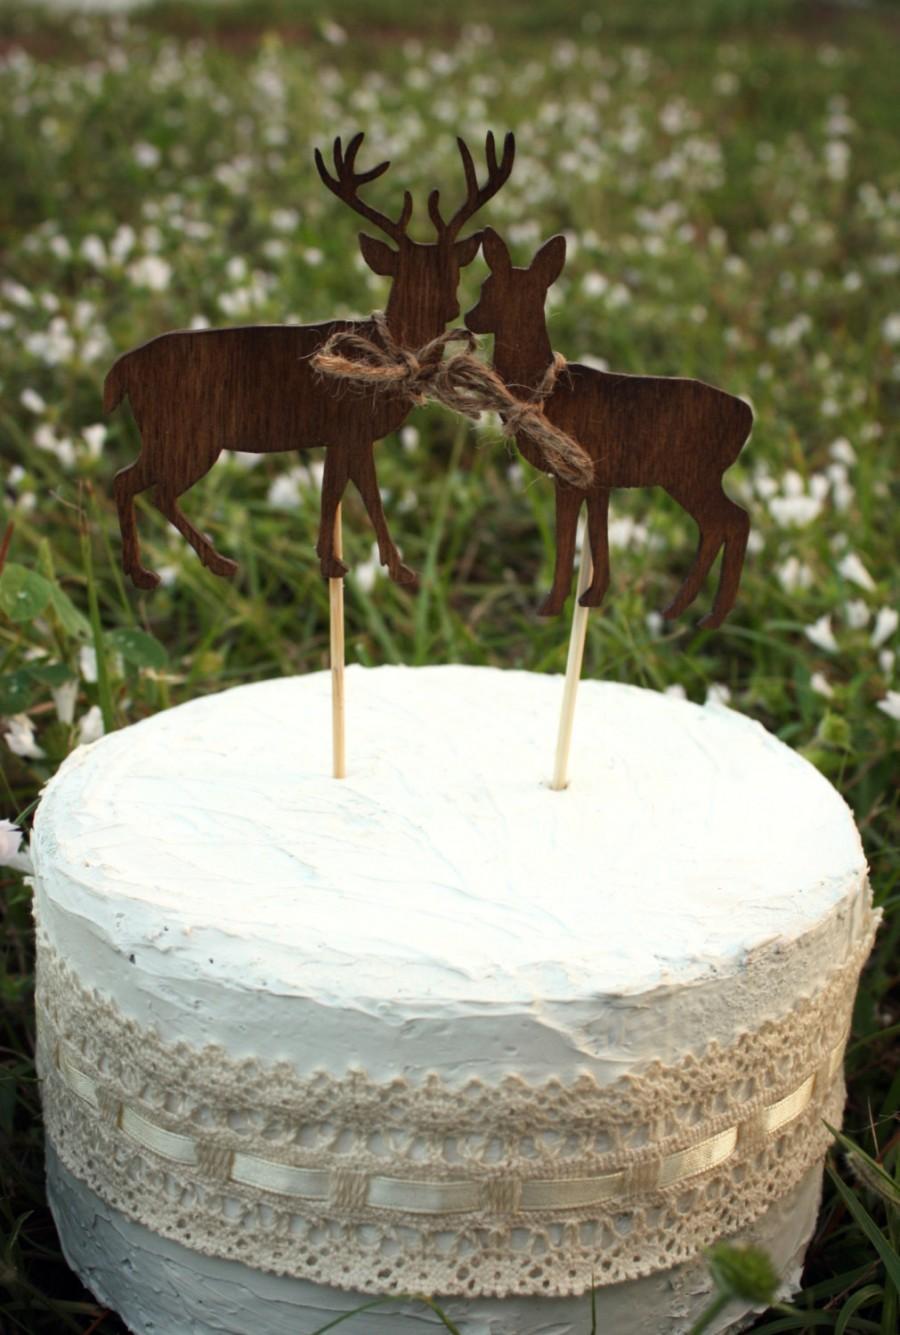 Mariage - Deer on sticks-wedding cake topper-deer-wedding-buck and doe-woodland wedding-rustic-wedding cake topper-groom's cake topper-hunter-groom